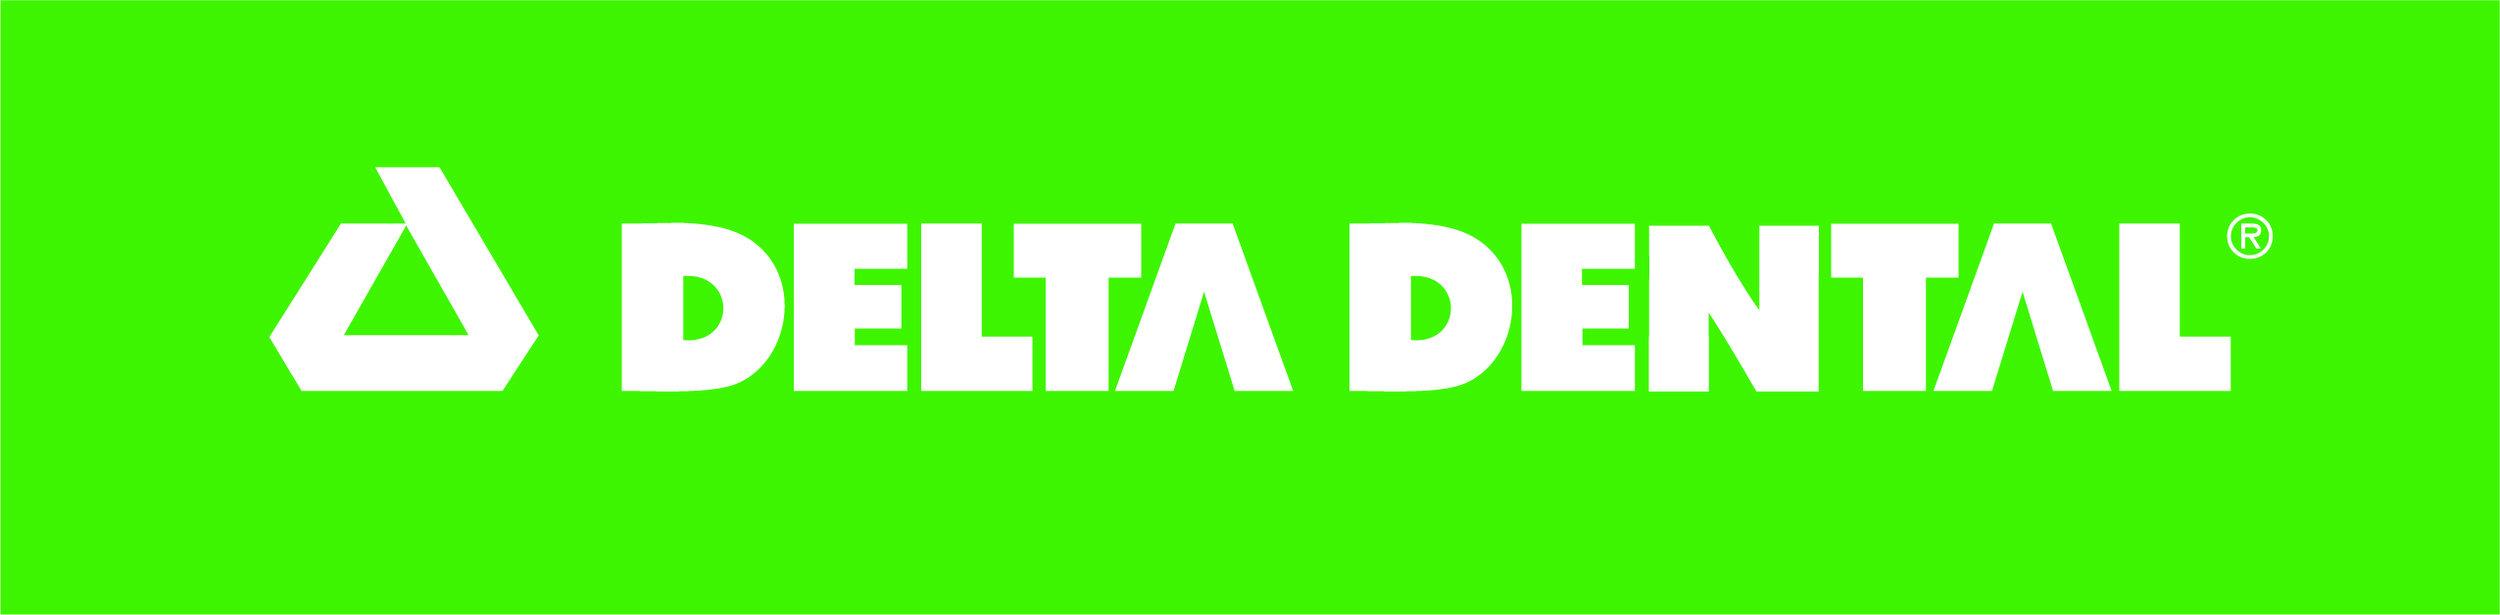 delta dental Logo Bounding Box PMS361C Print.jpg